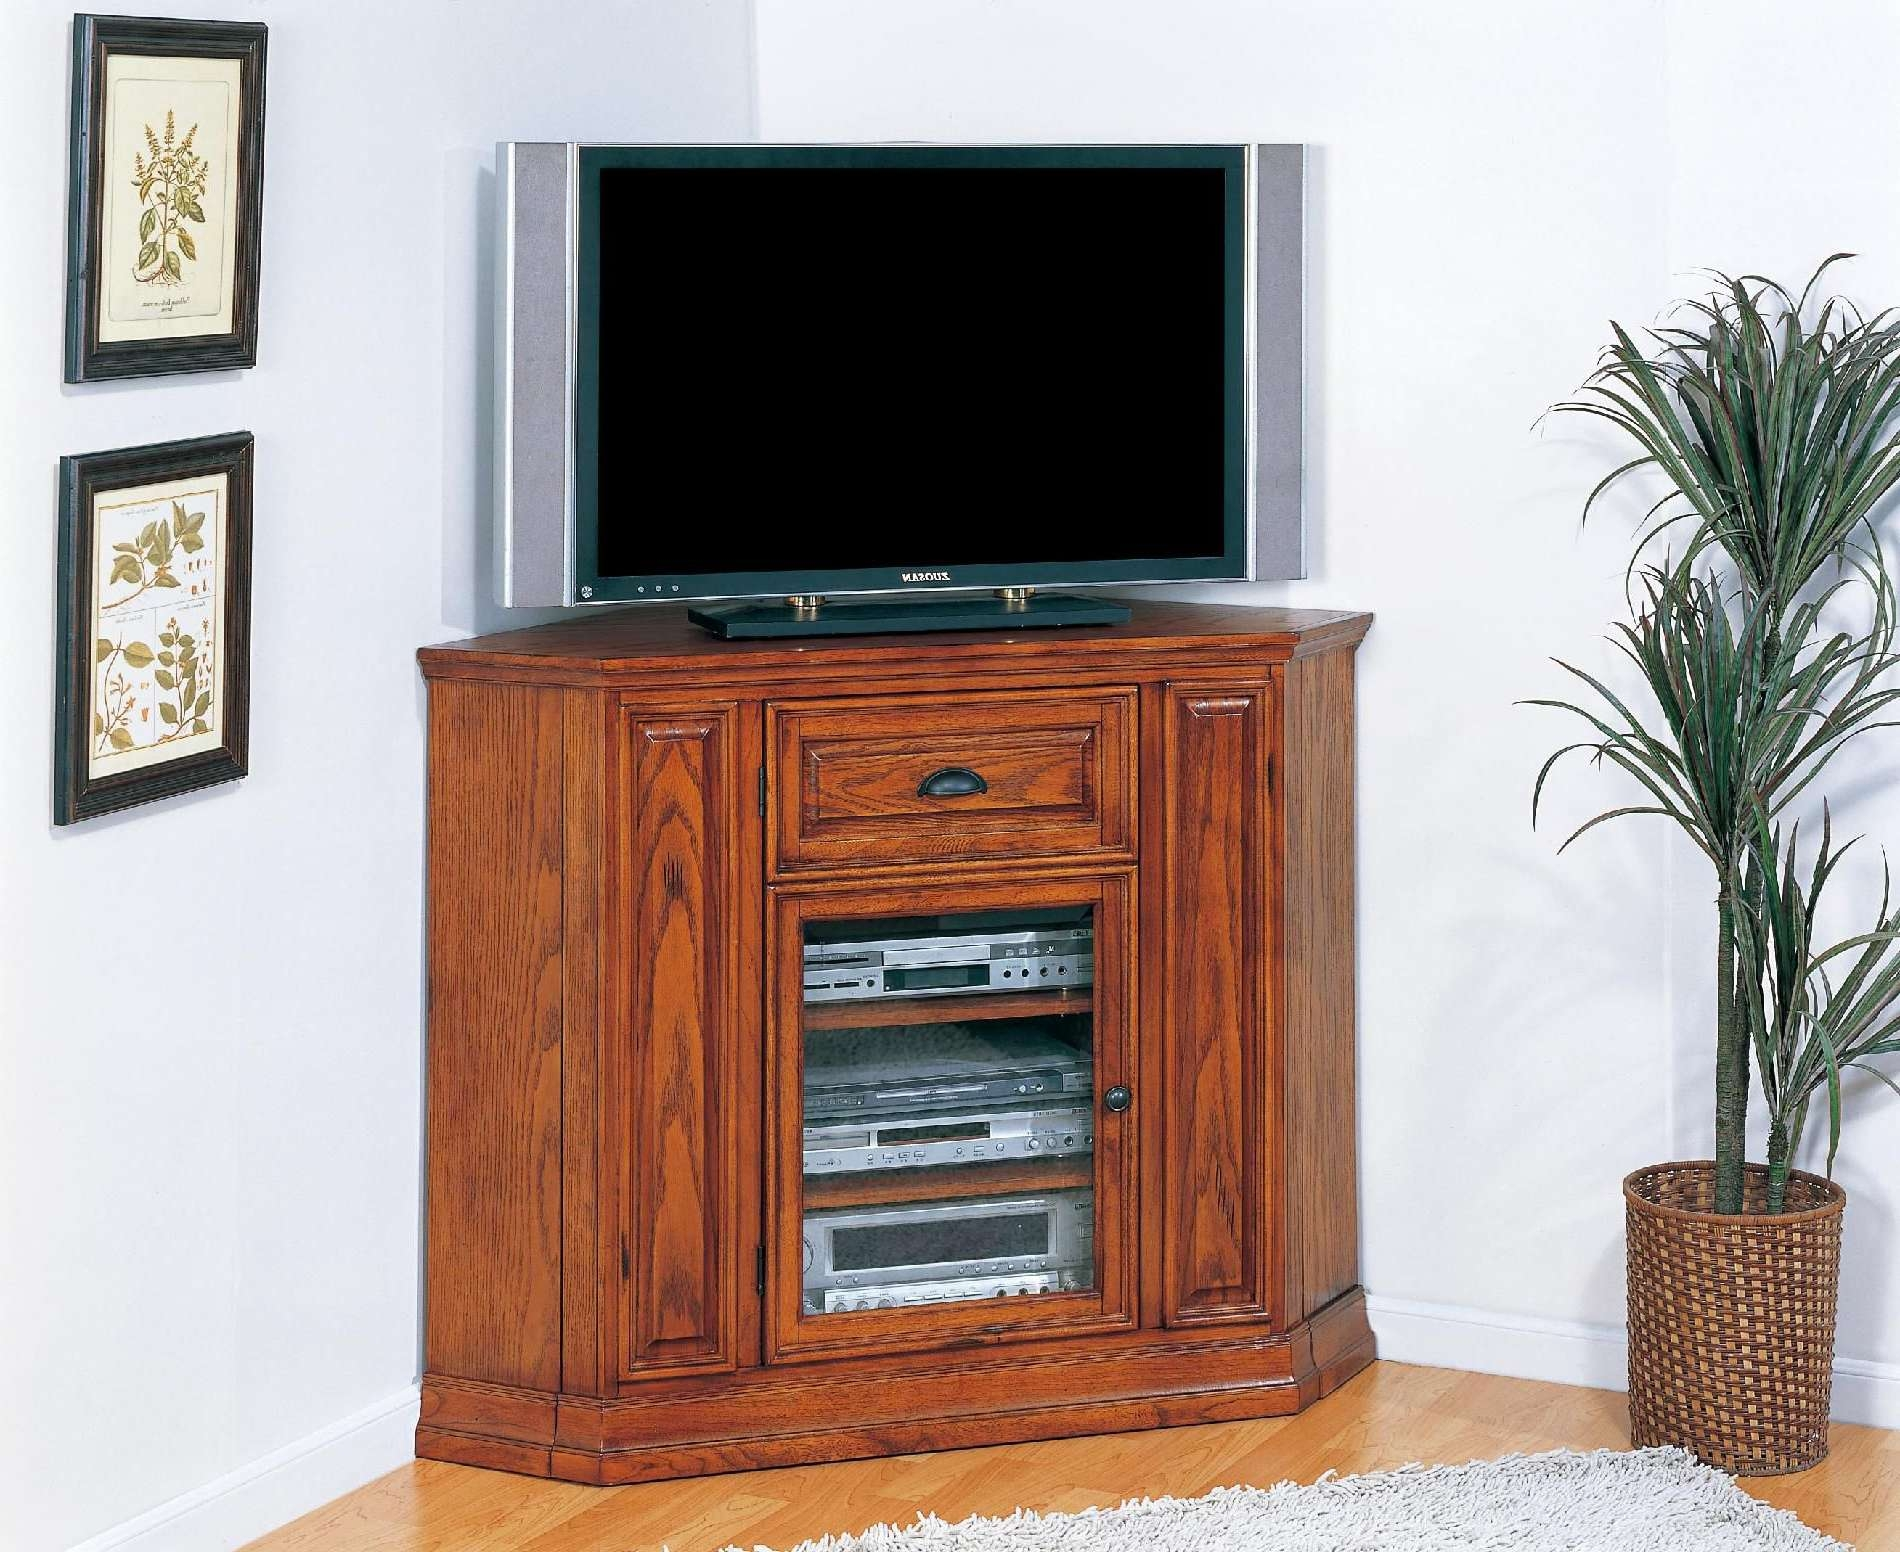 Tall Corner Tv Stand White (View 11 of 15)